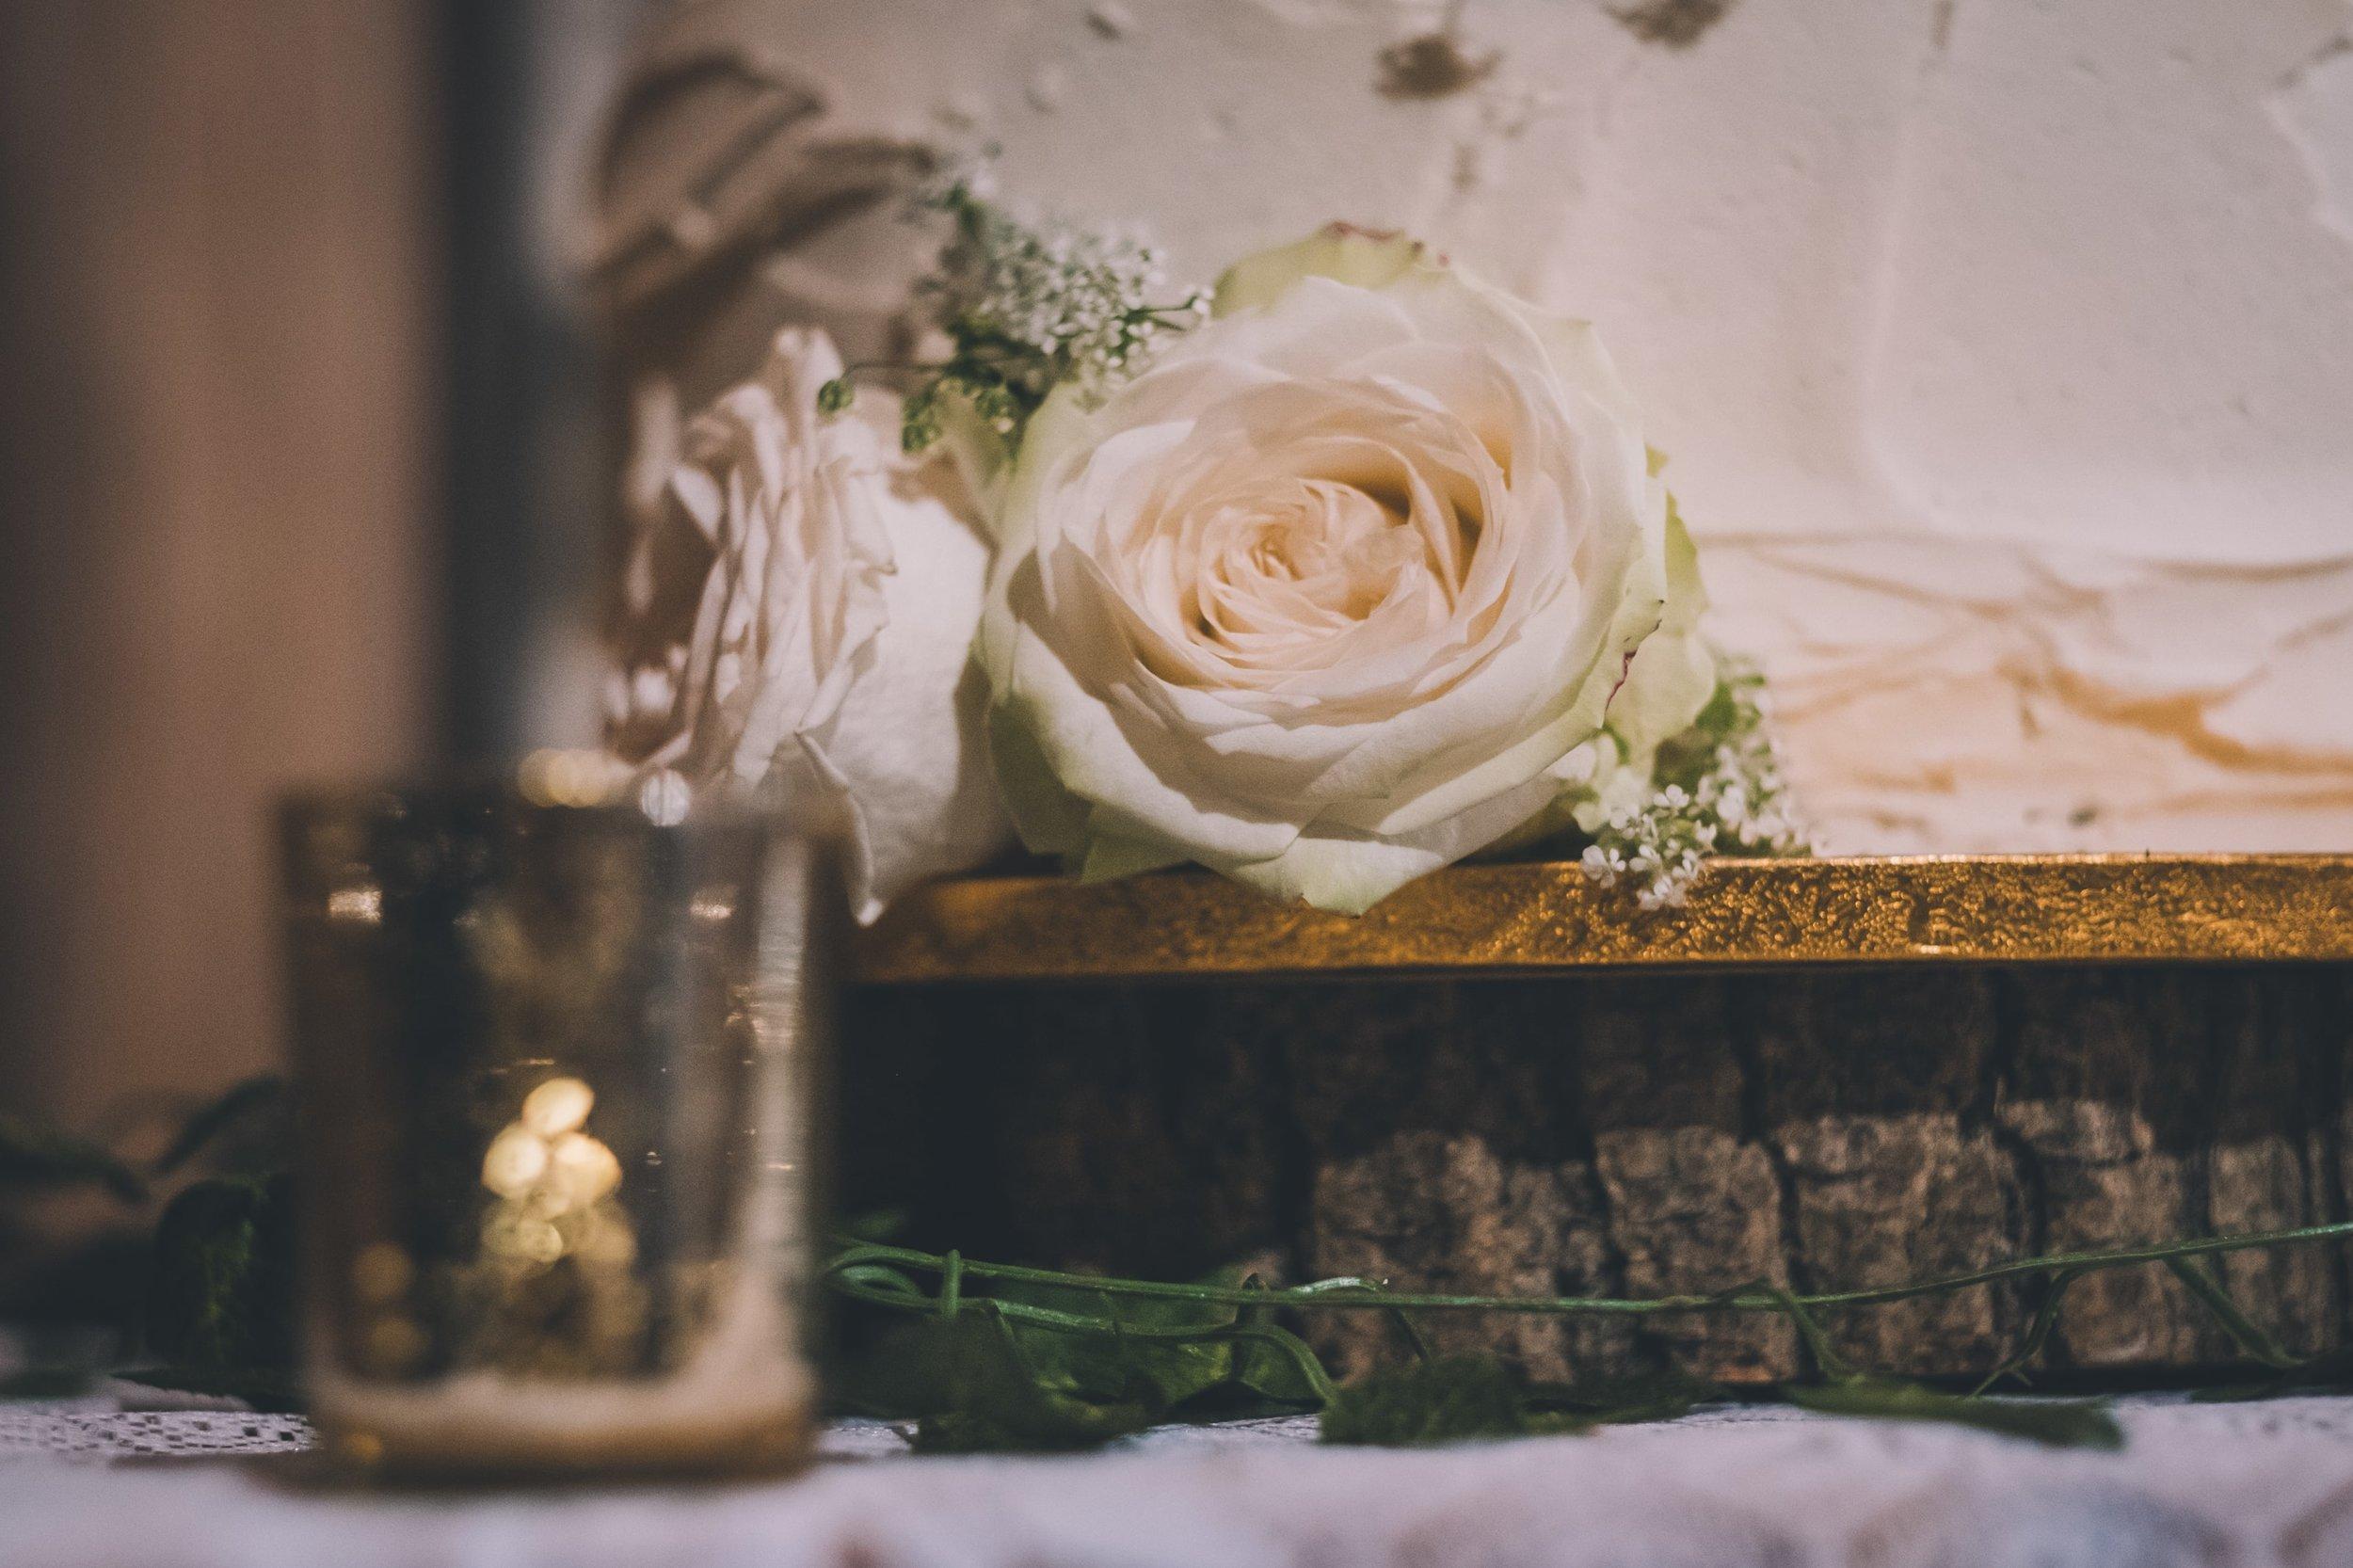 Finding a modern wedding cake designer in London and Surrey